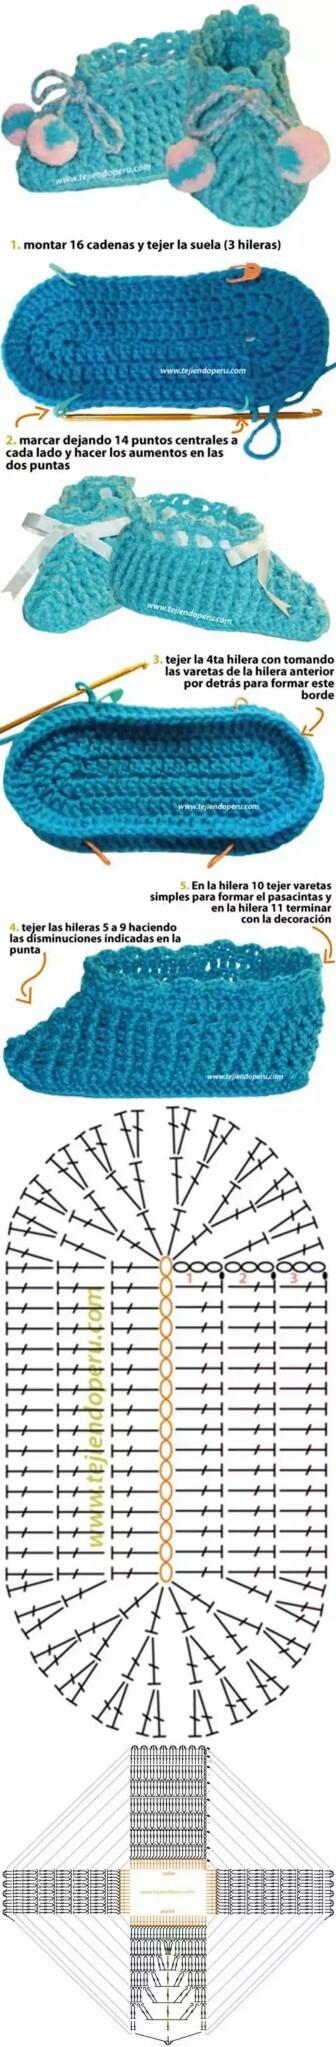 Pin de Carmen Fagalde en Sapatinhos de crochê | Pinterest ...